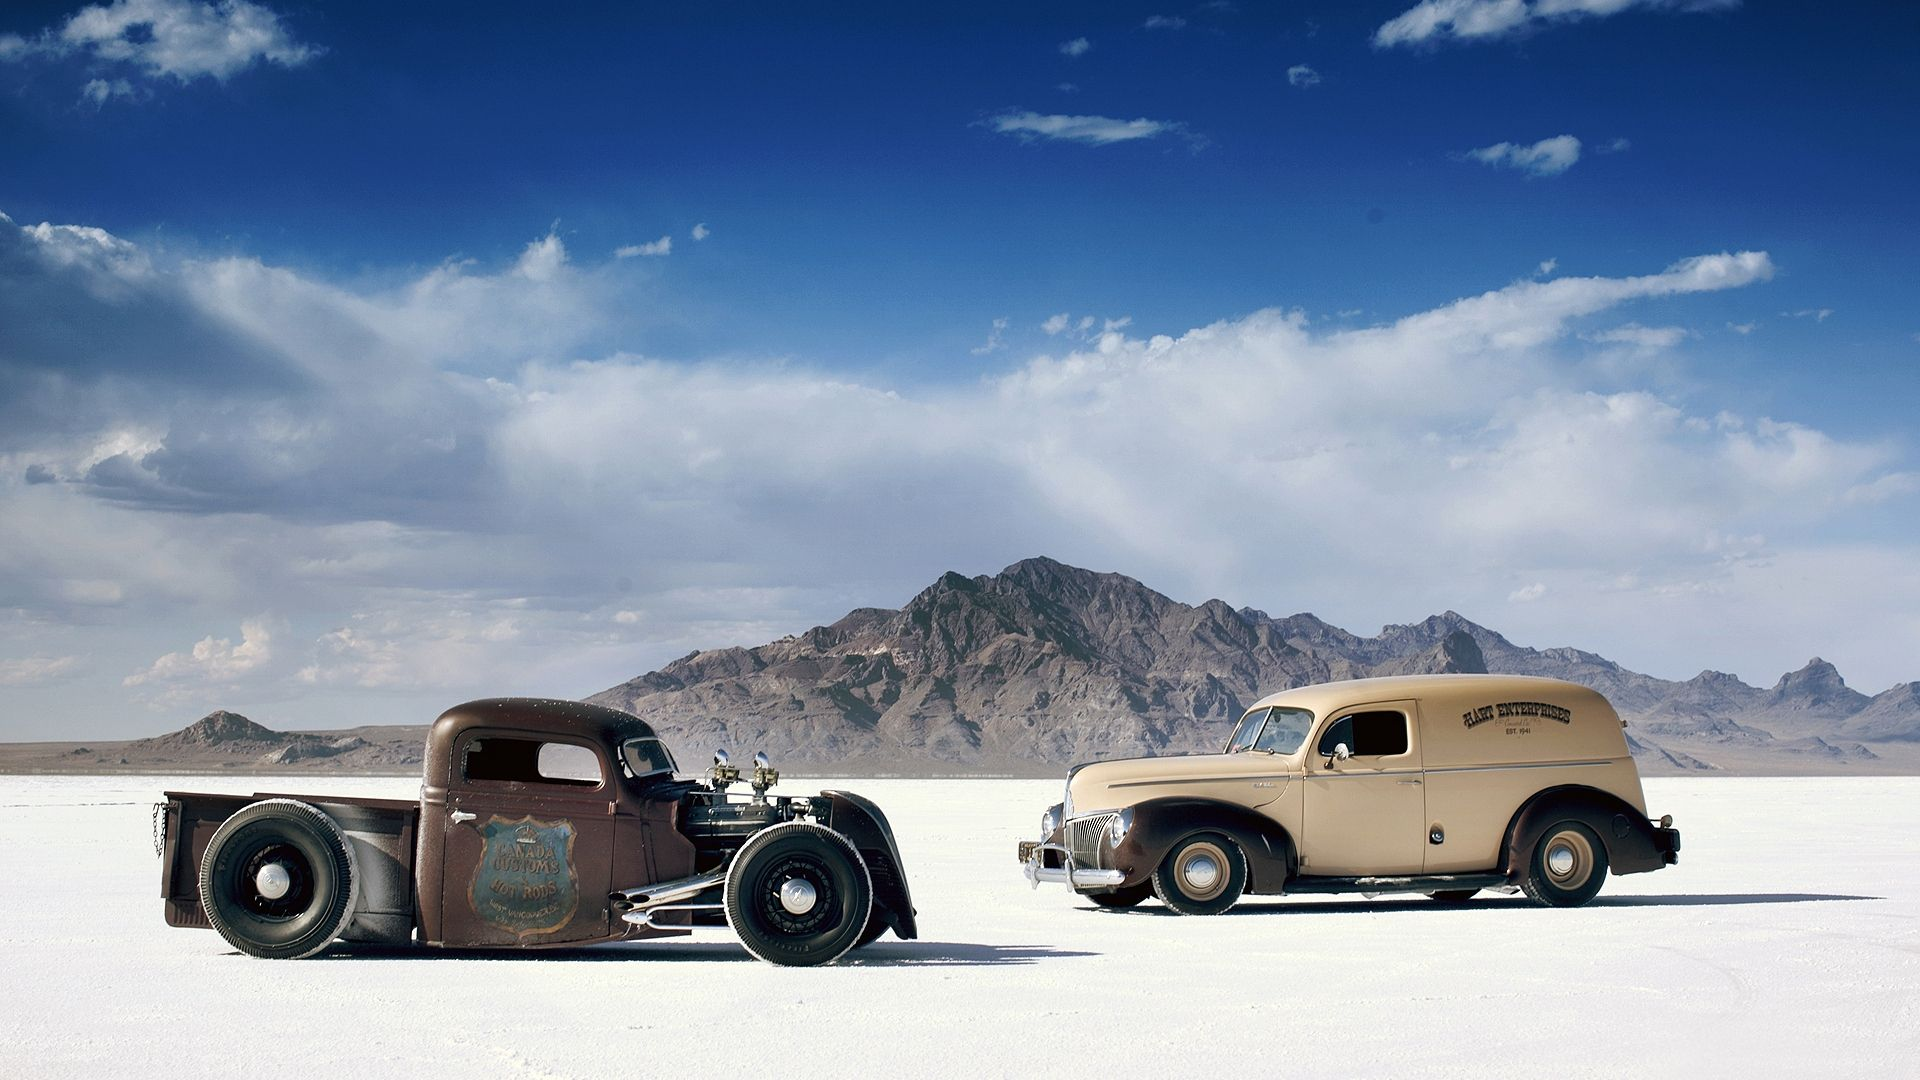 Classic Car Wallpaper Hd Wallpapers Hd 1080p Desktop Wallpapers